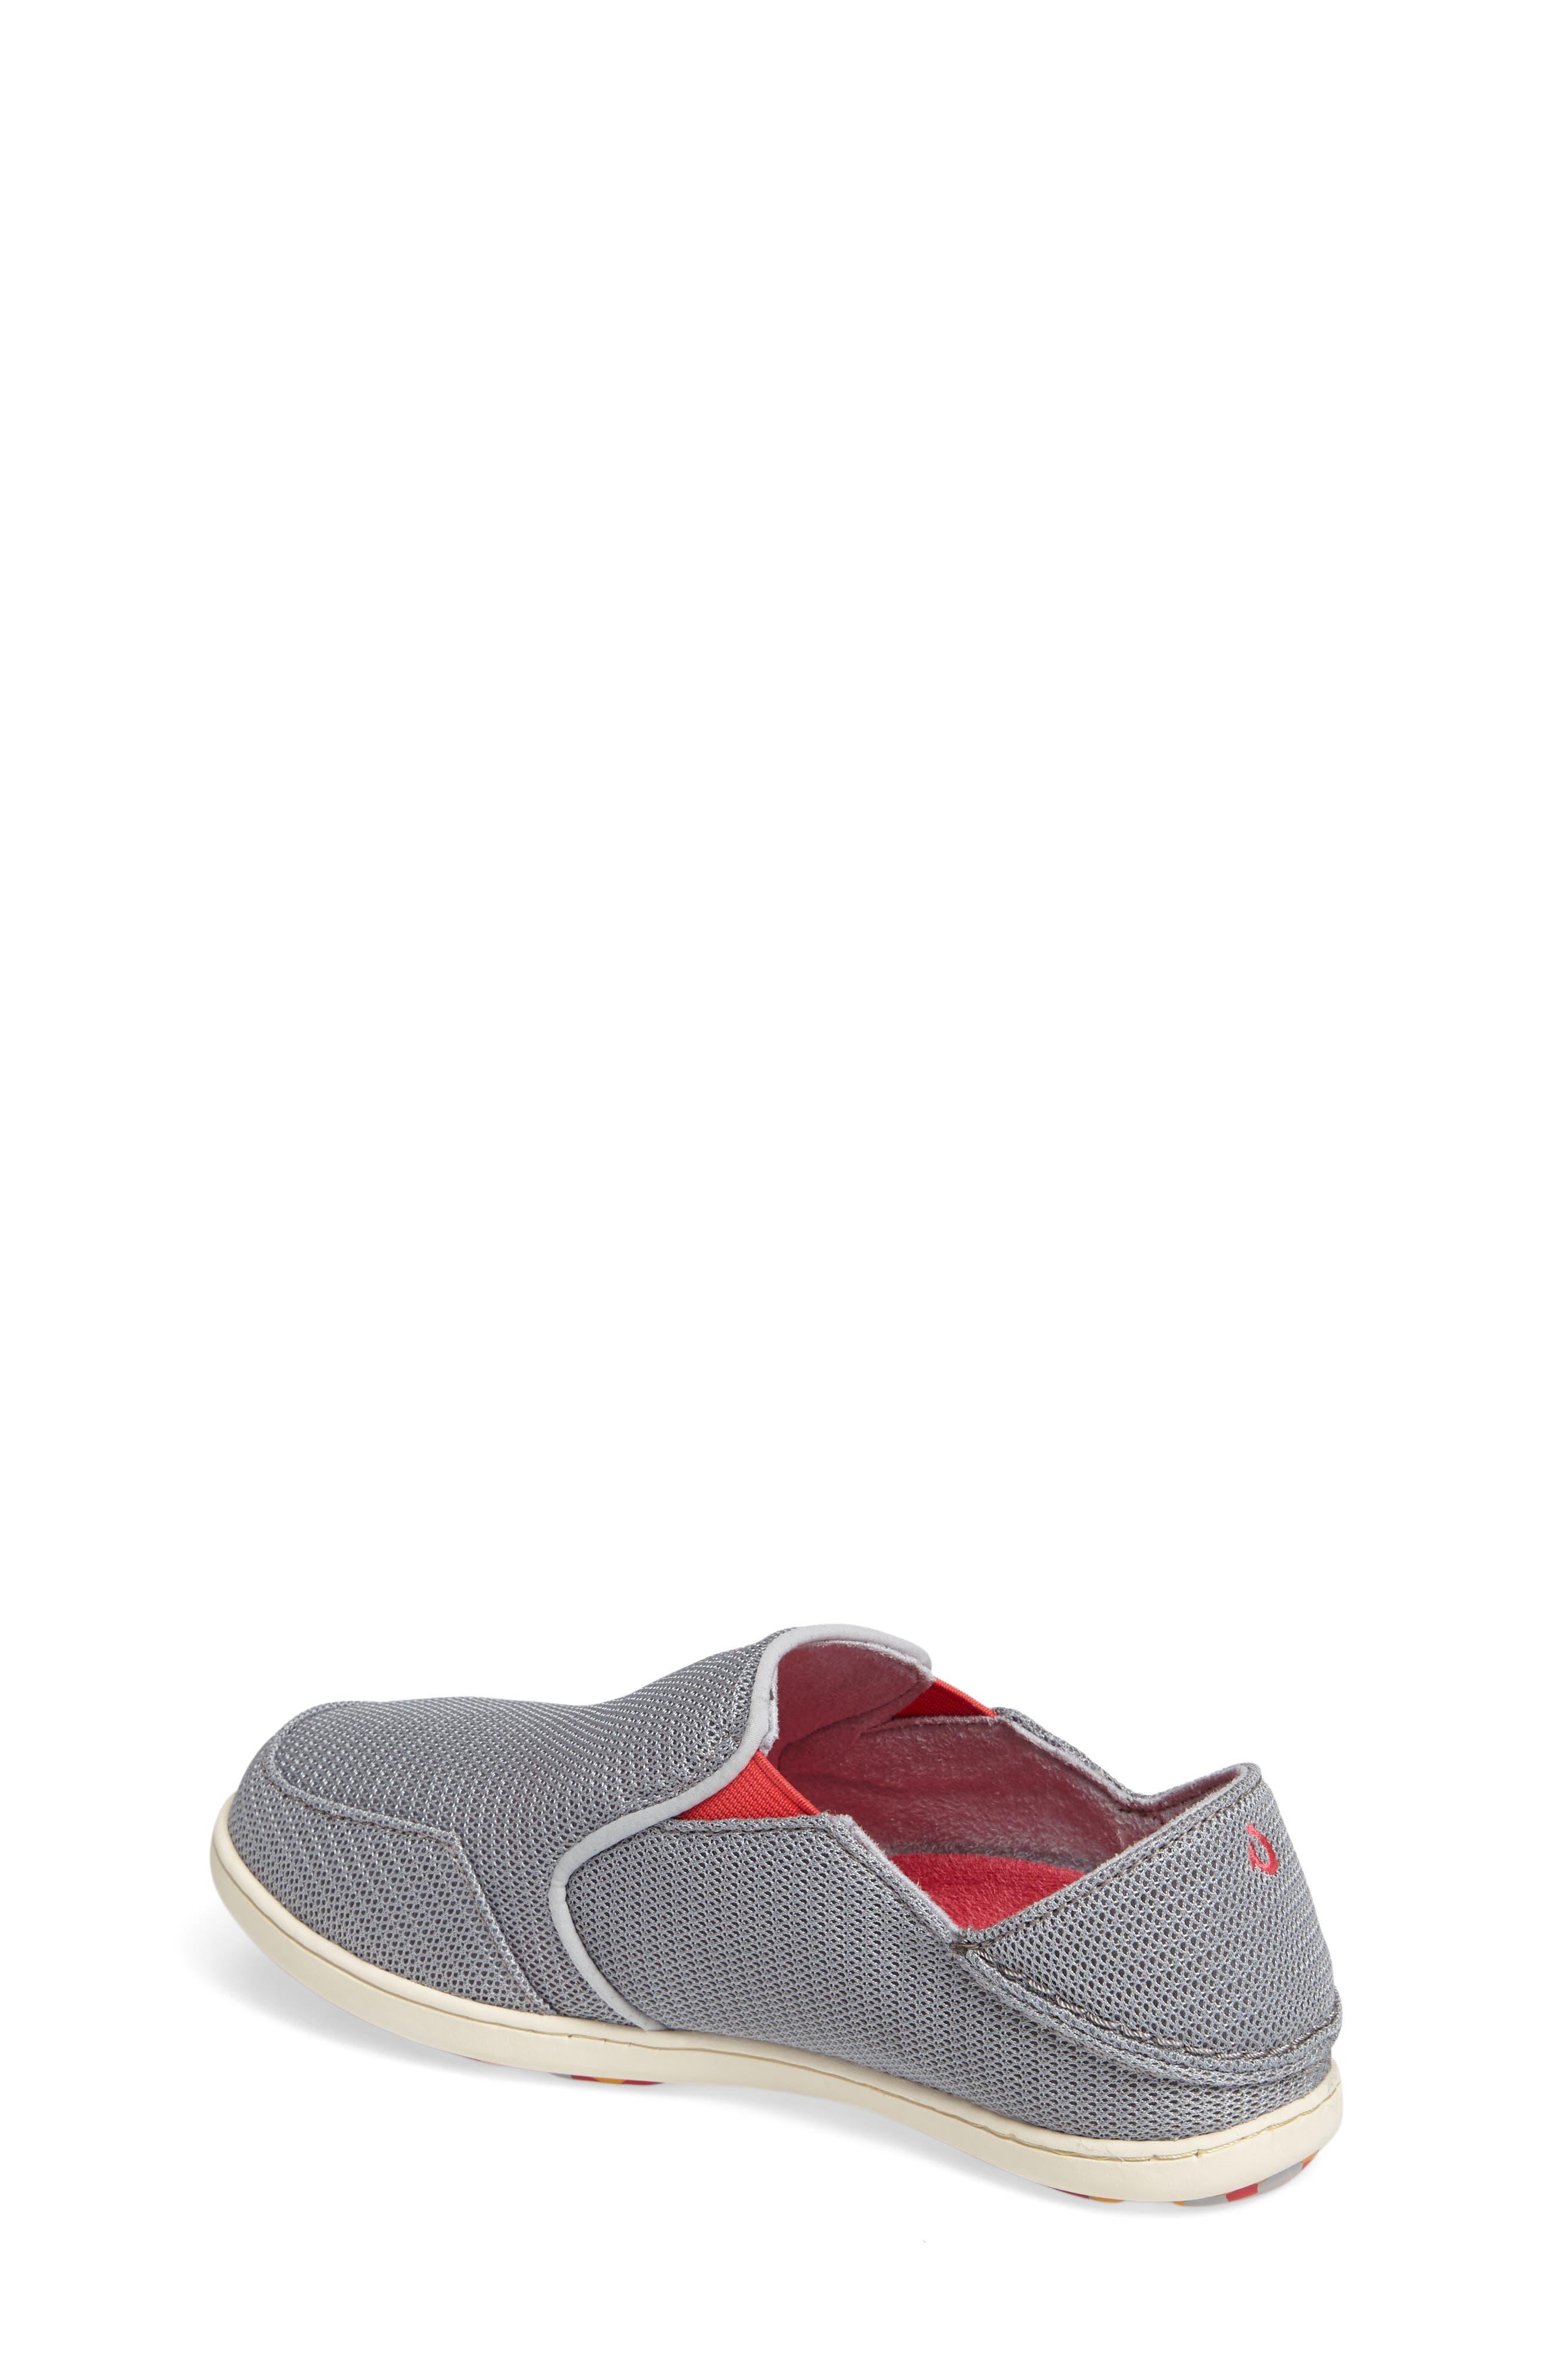 'Nohea' Mesh Shoe,                             Alternate thumbnail 2, color,                             PALE GREY/ DARK HIBISCUS